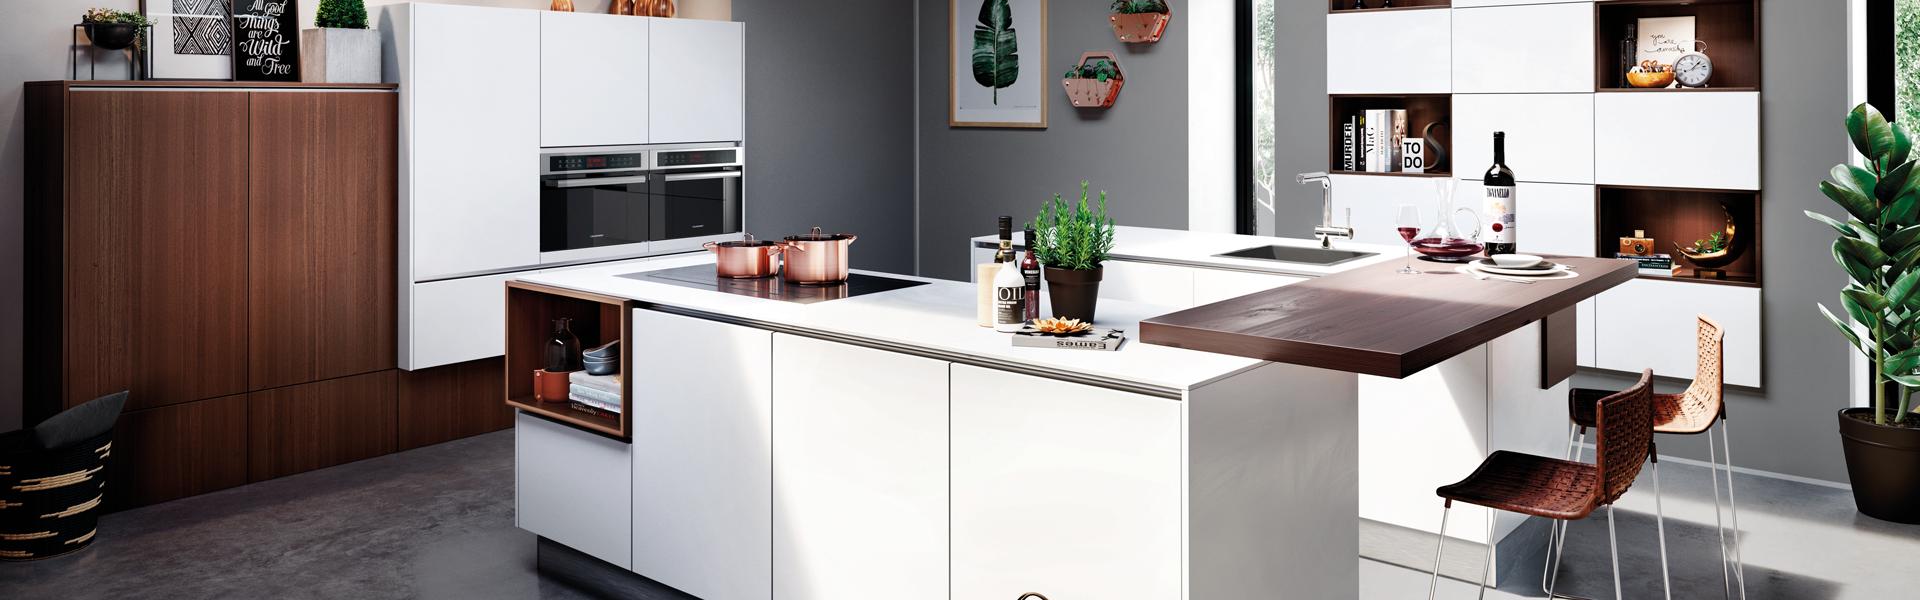 Houten woonkeuken | Eigenhuis Keukens